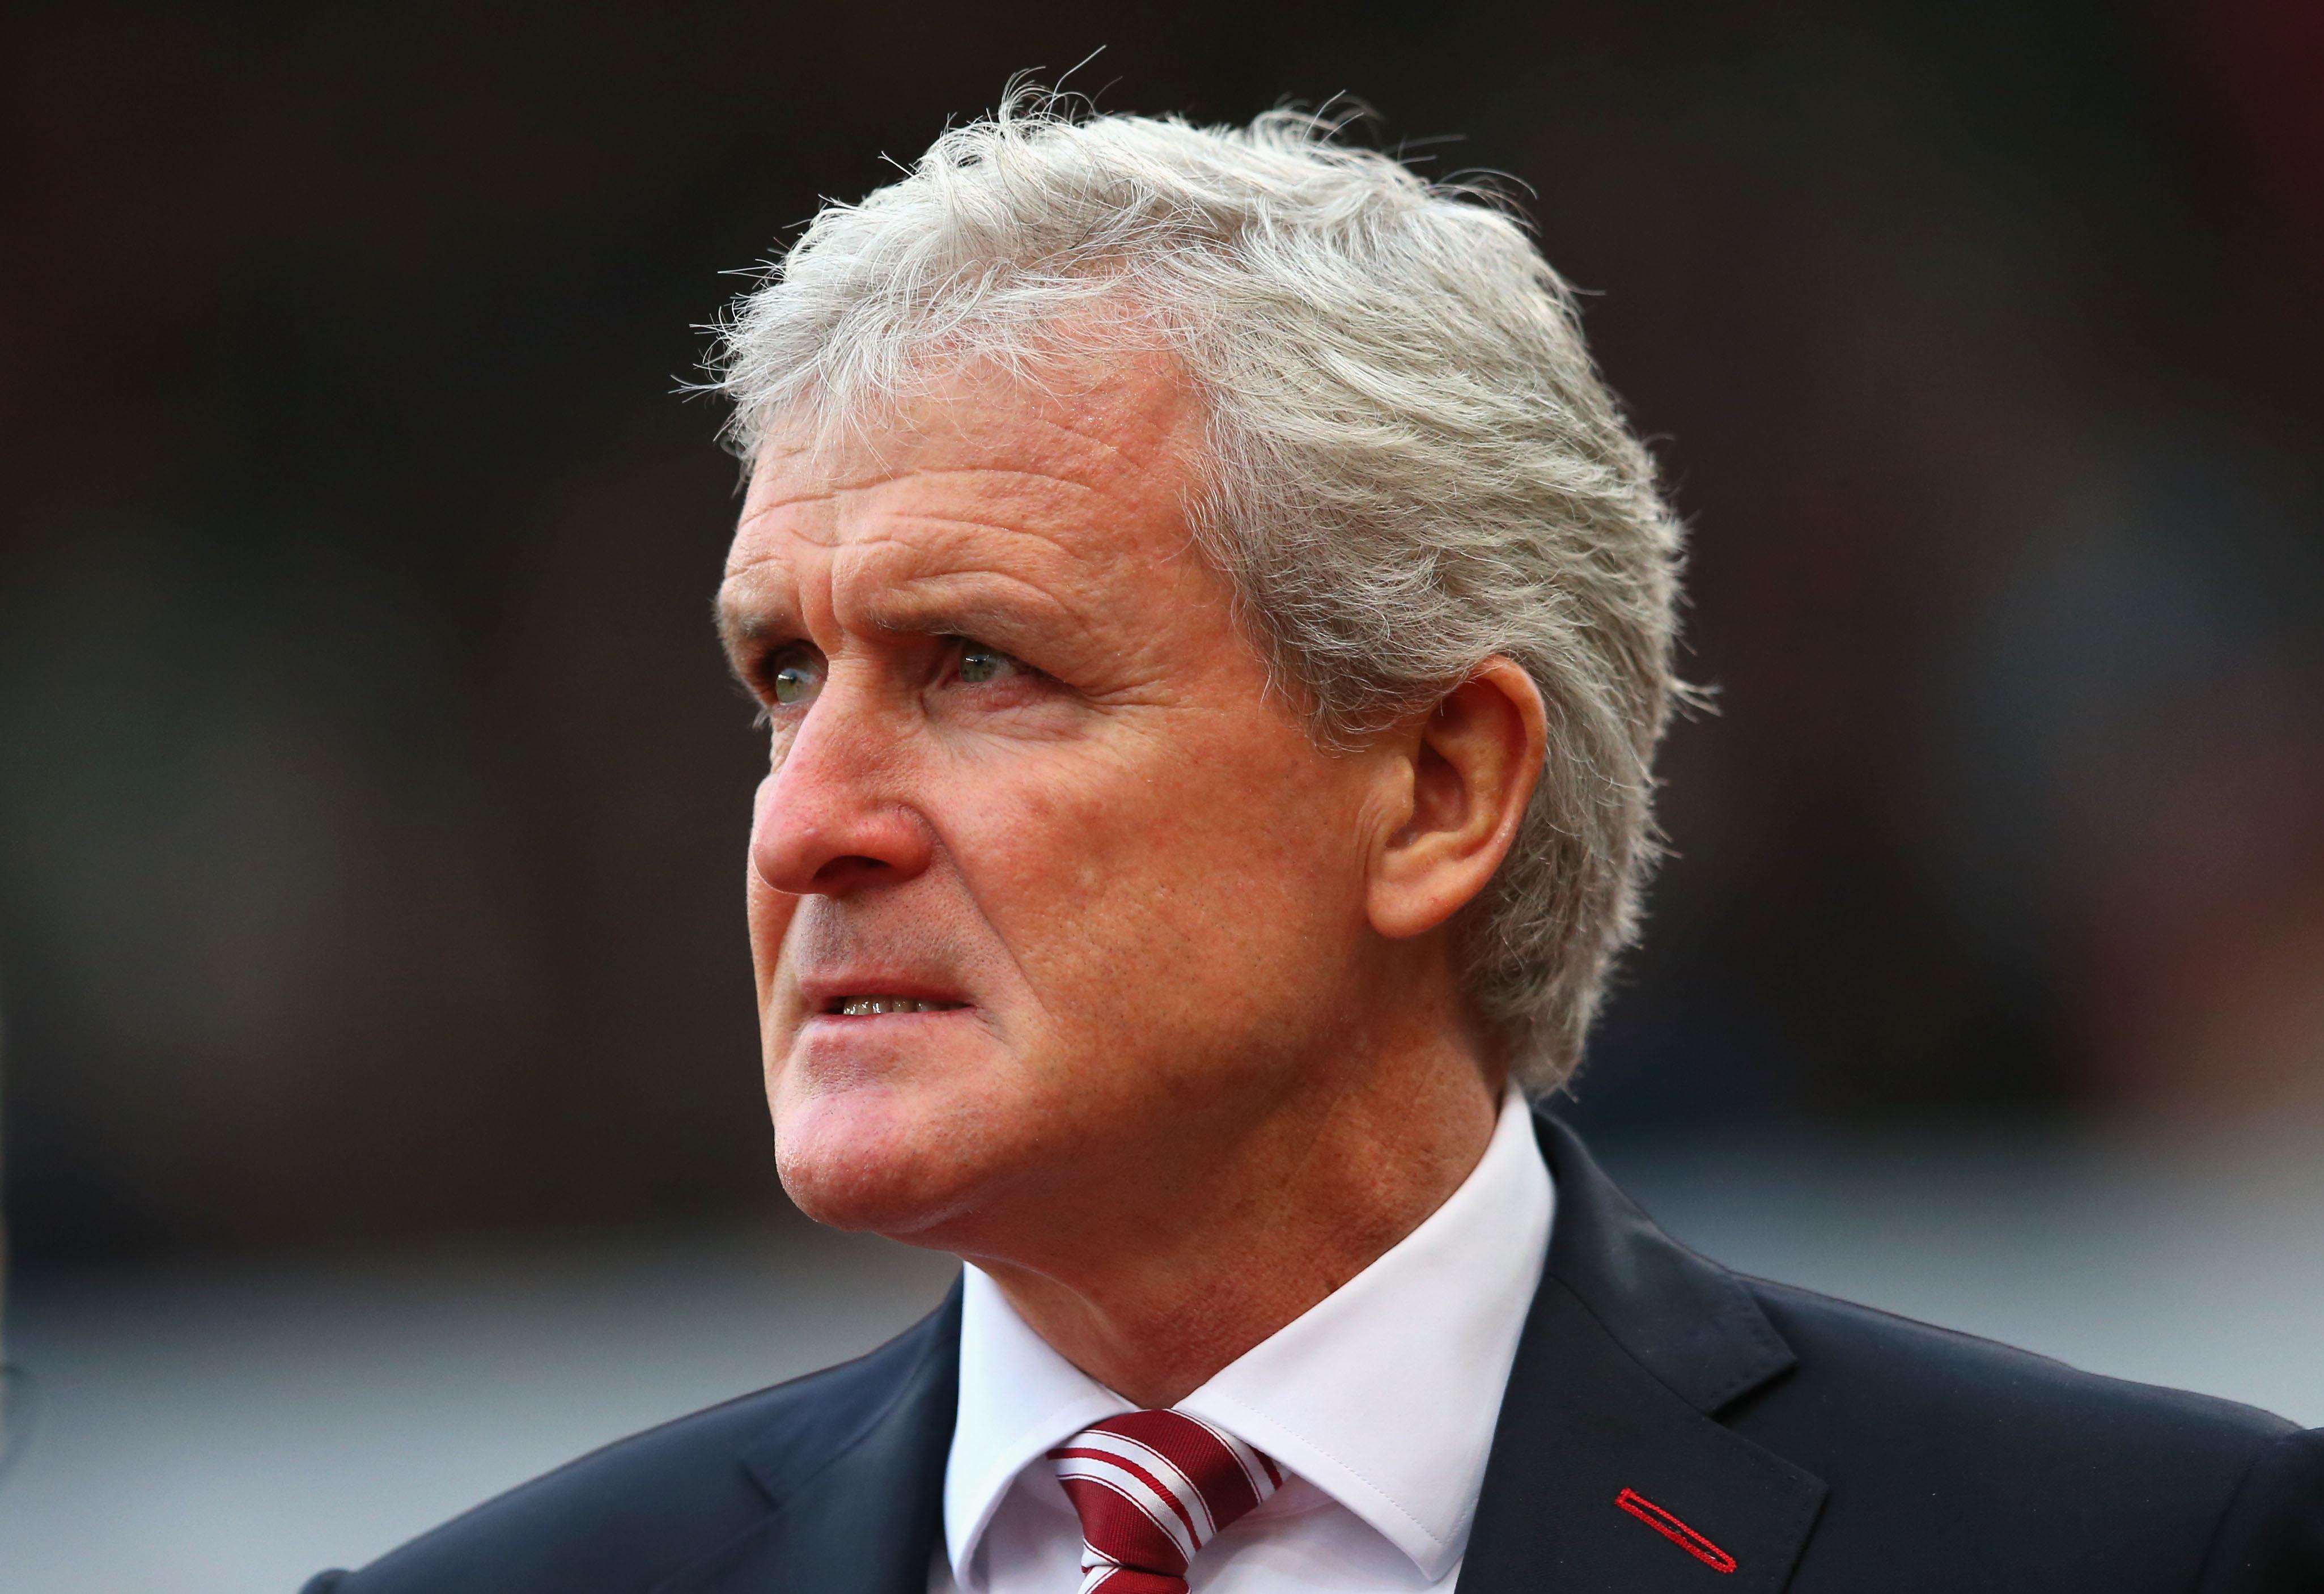 Stoke star Ryan Shawcross set to miss Arsenal clash, Mark Hughes confirms